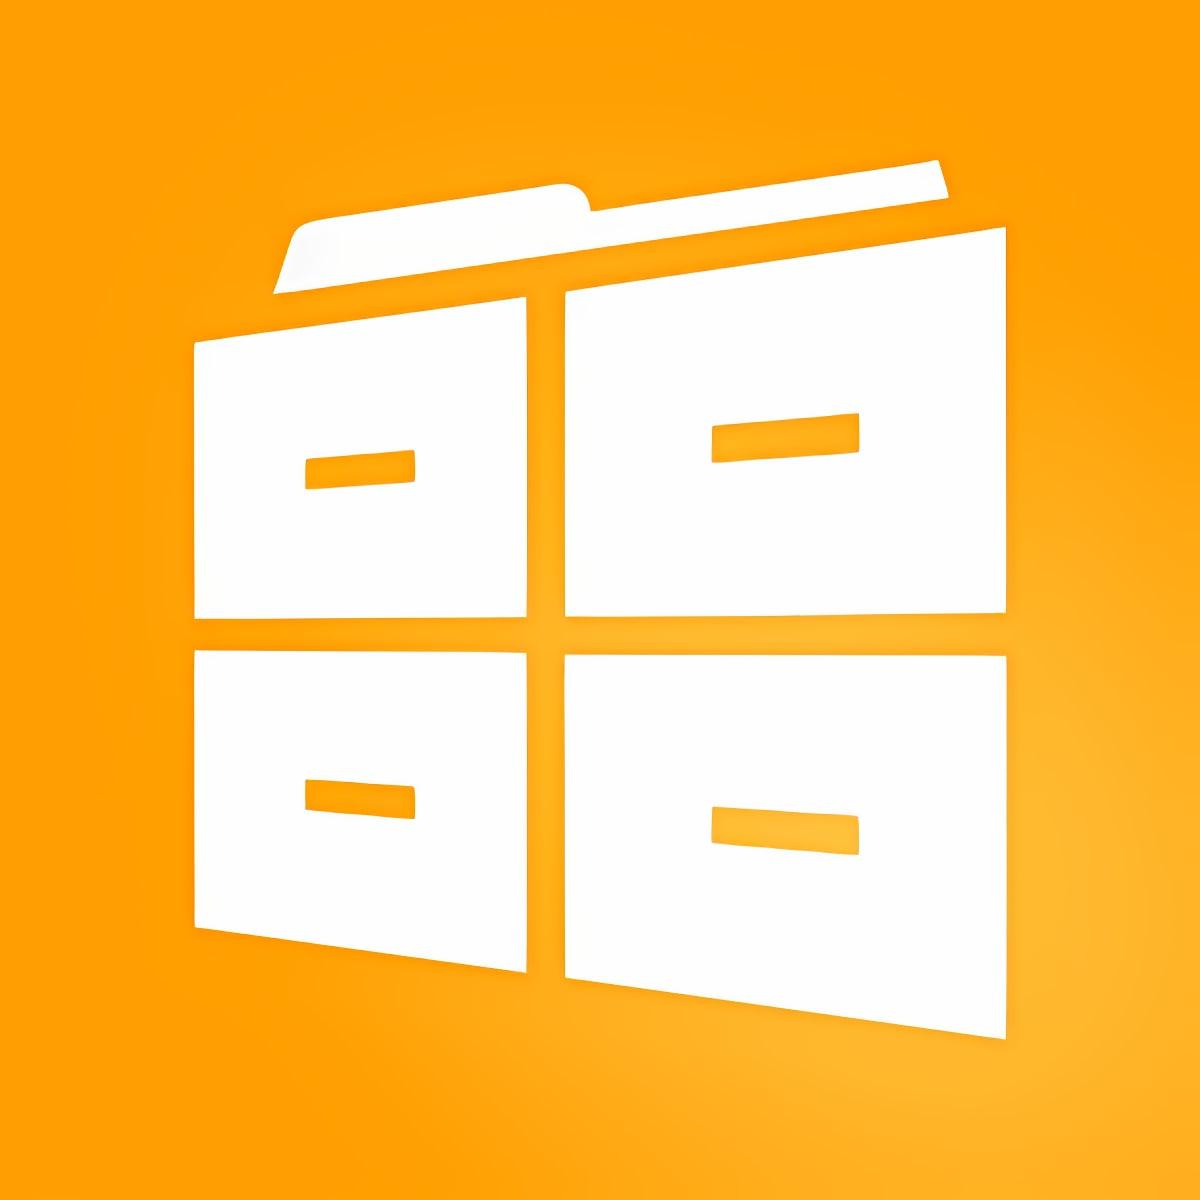 Aerize Explorer for Windows 10 8.1.0.528